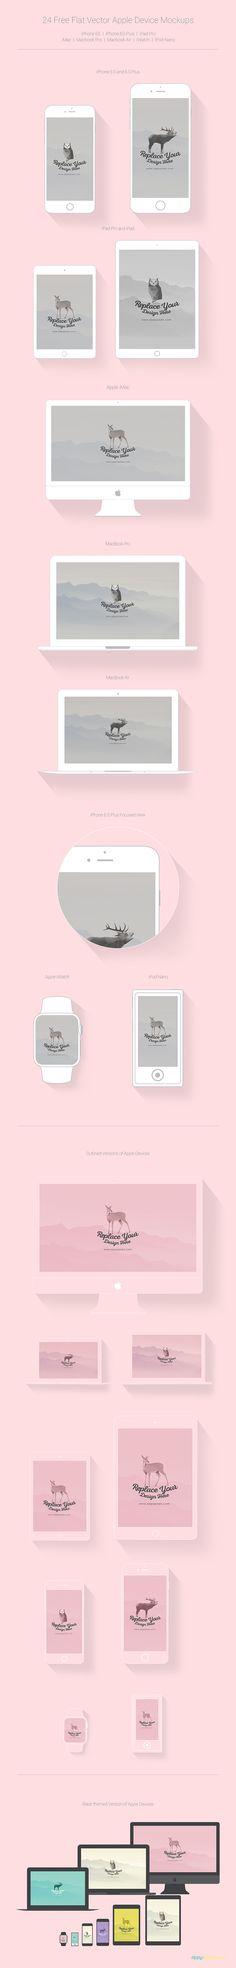 Download 13 Device Mockup Ideas Mockup Iphone Mockup Design Freebie